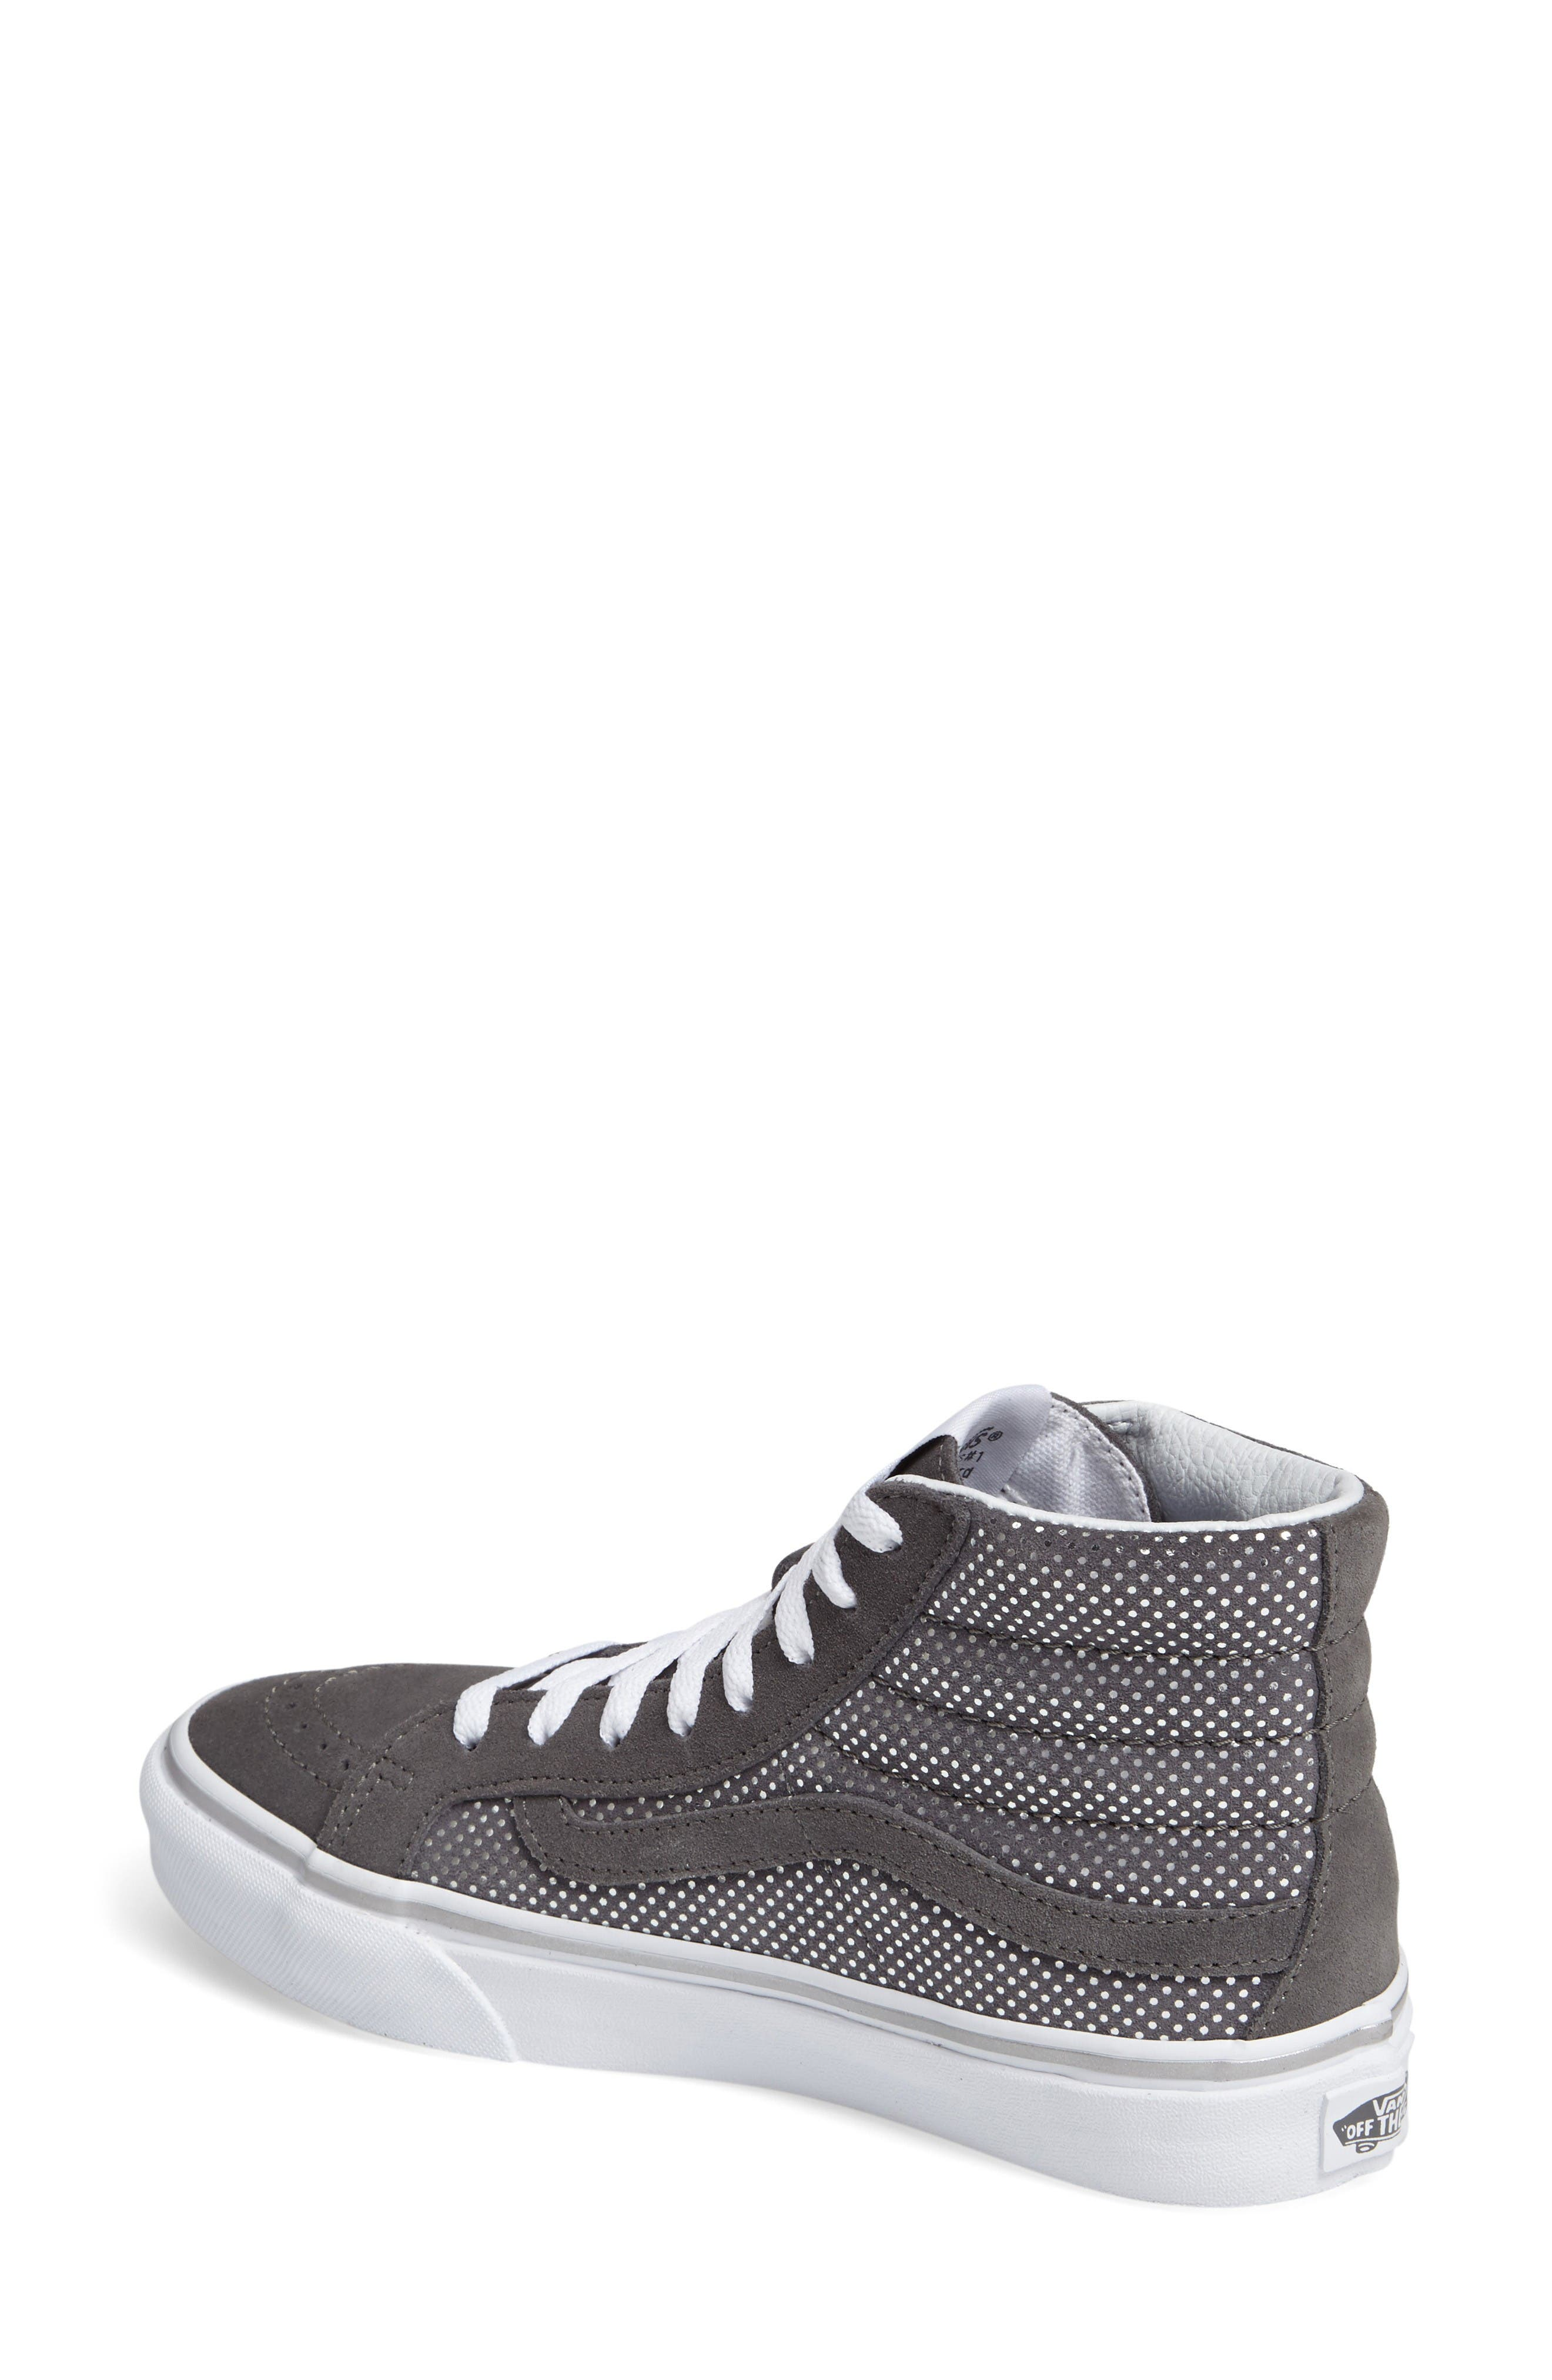 Alternate Image 2  - Vans Sk8-Hi Slim High Top Sneaker (Women)